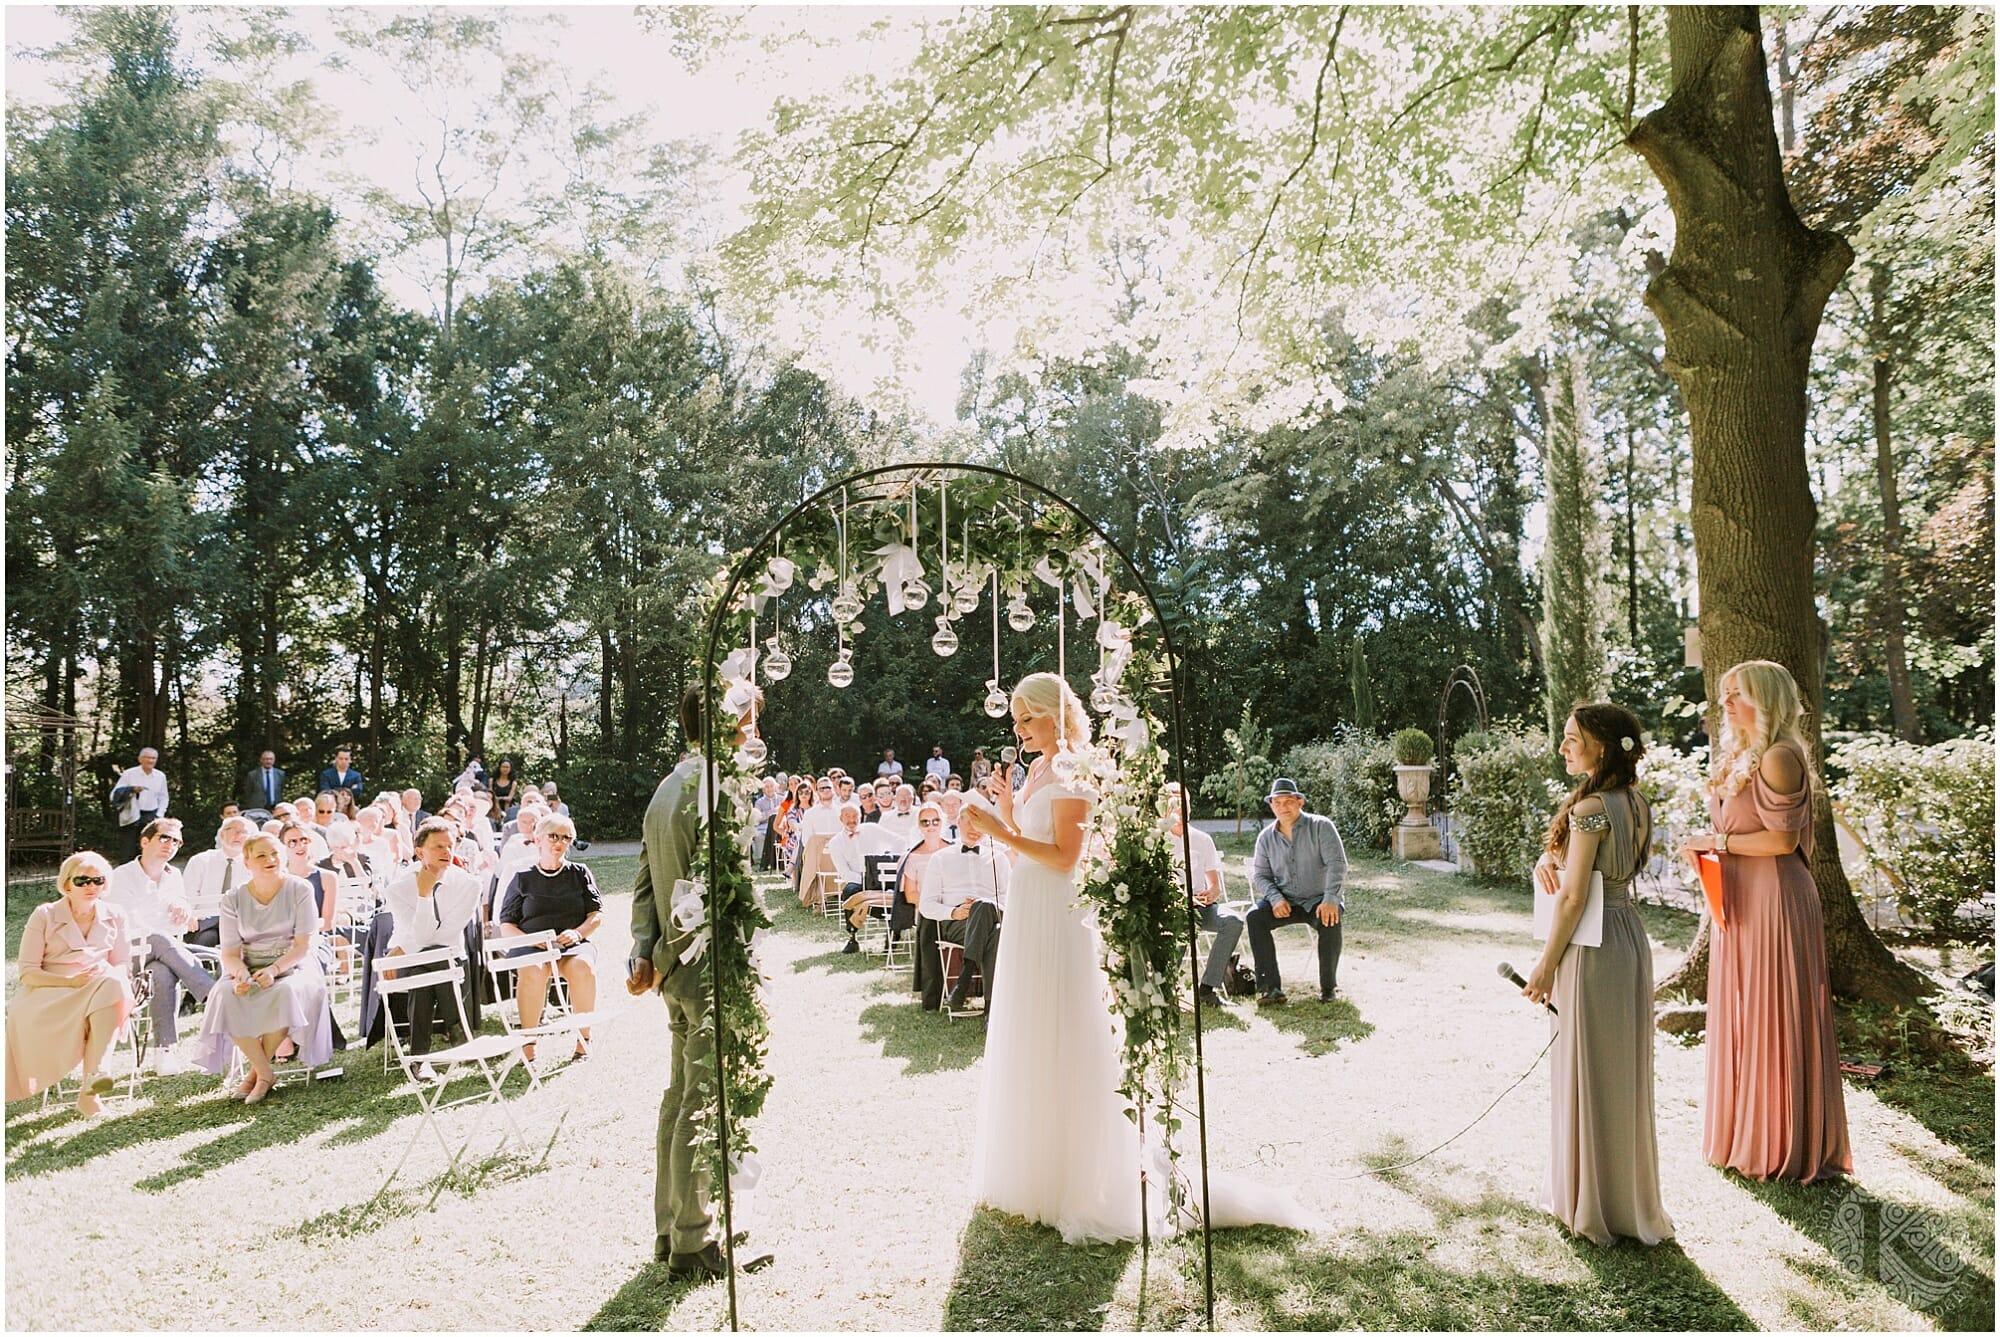 Kateryna-photos-photographe-mariage-chateau-des-3-fontaines-provence-avignon-vaucluse-sud_0047.jpg